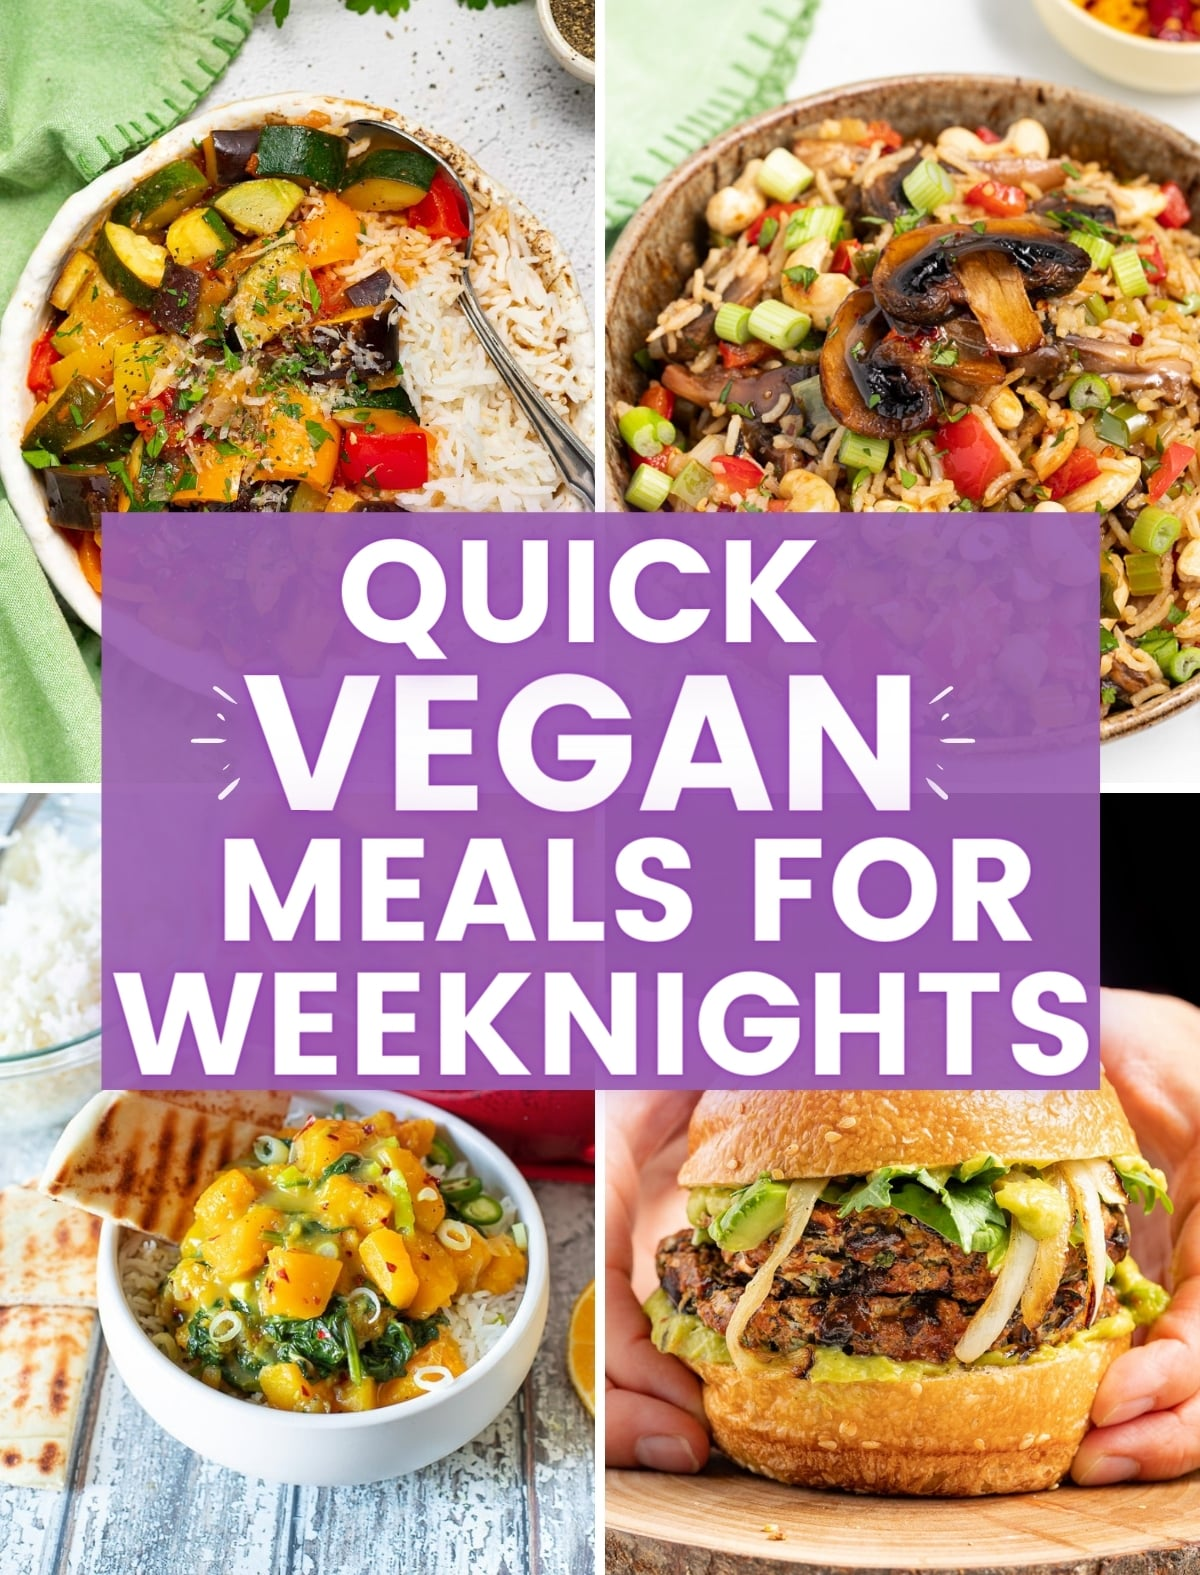 Quick Vegan Meals For Weeknights